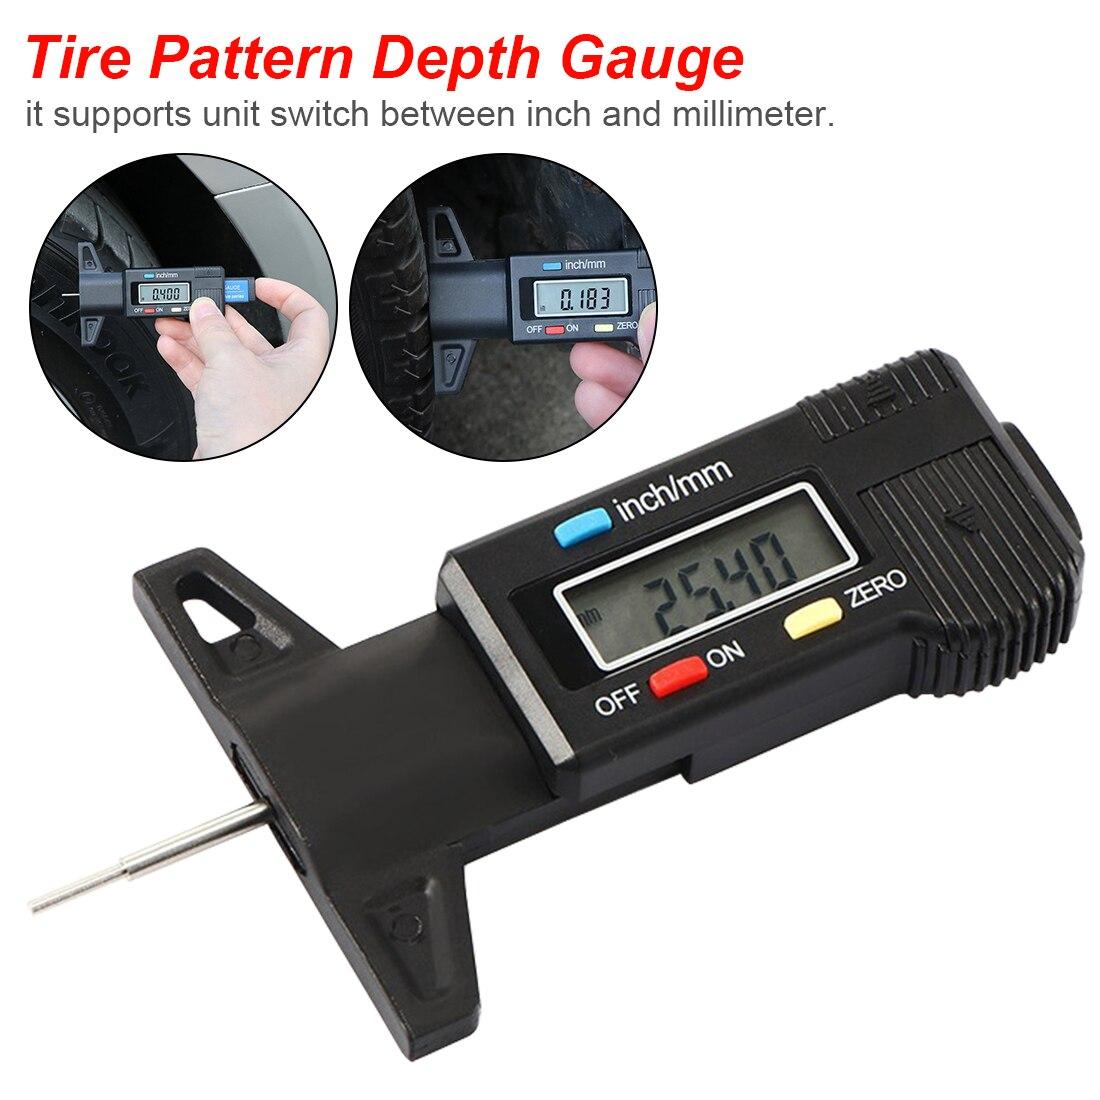 Digital Depth Gauge 0-25.4mm LCD Caliper Tread Depth Gauge For Motorbike/CarTester/Shoe Pad Tire Measurer Tool Caliper